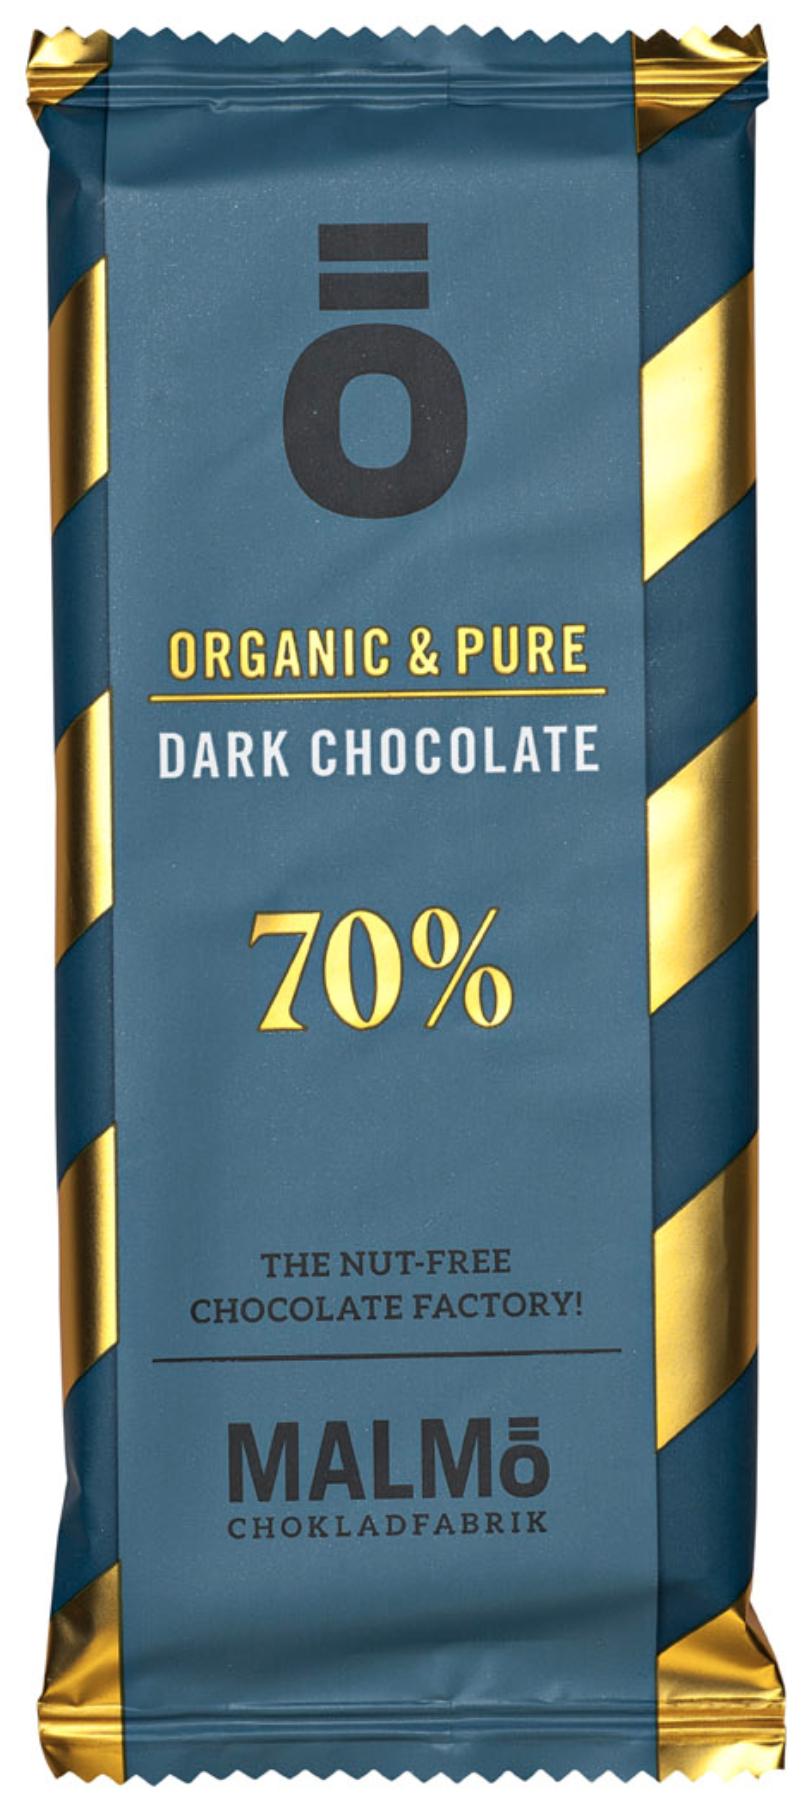 MALMÖ Chokoladfabrik | Nußfreie Schokolade »Ö-Serie« 70% - 55g | BIO MHD 09.12.2021